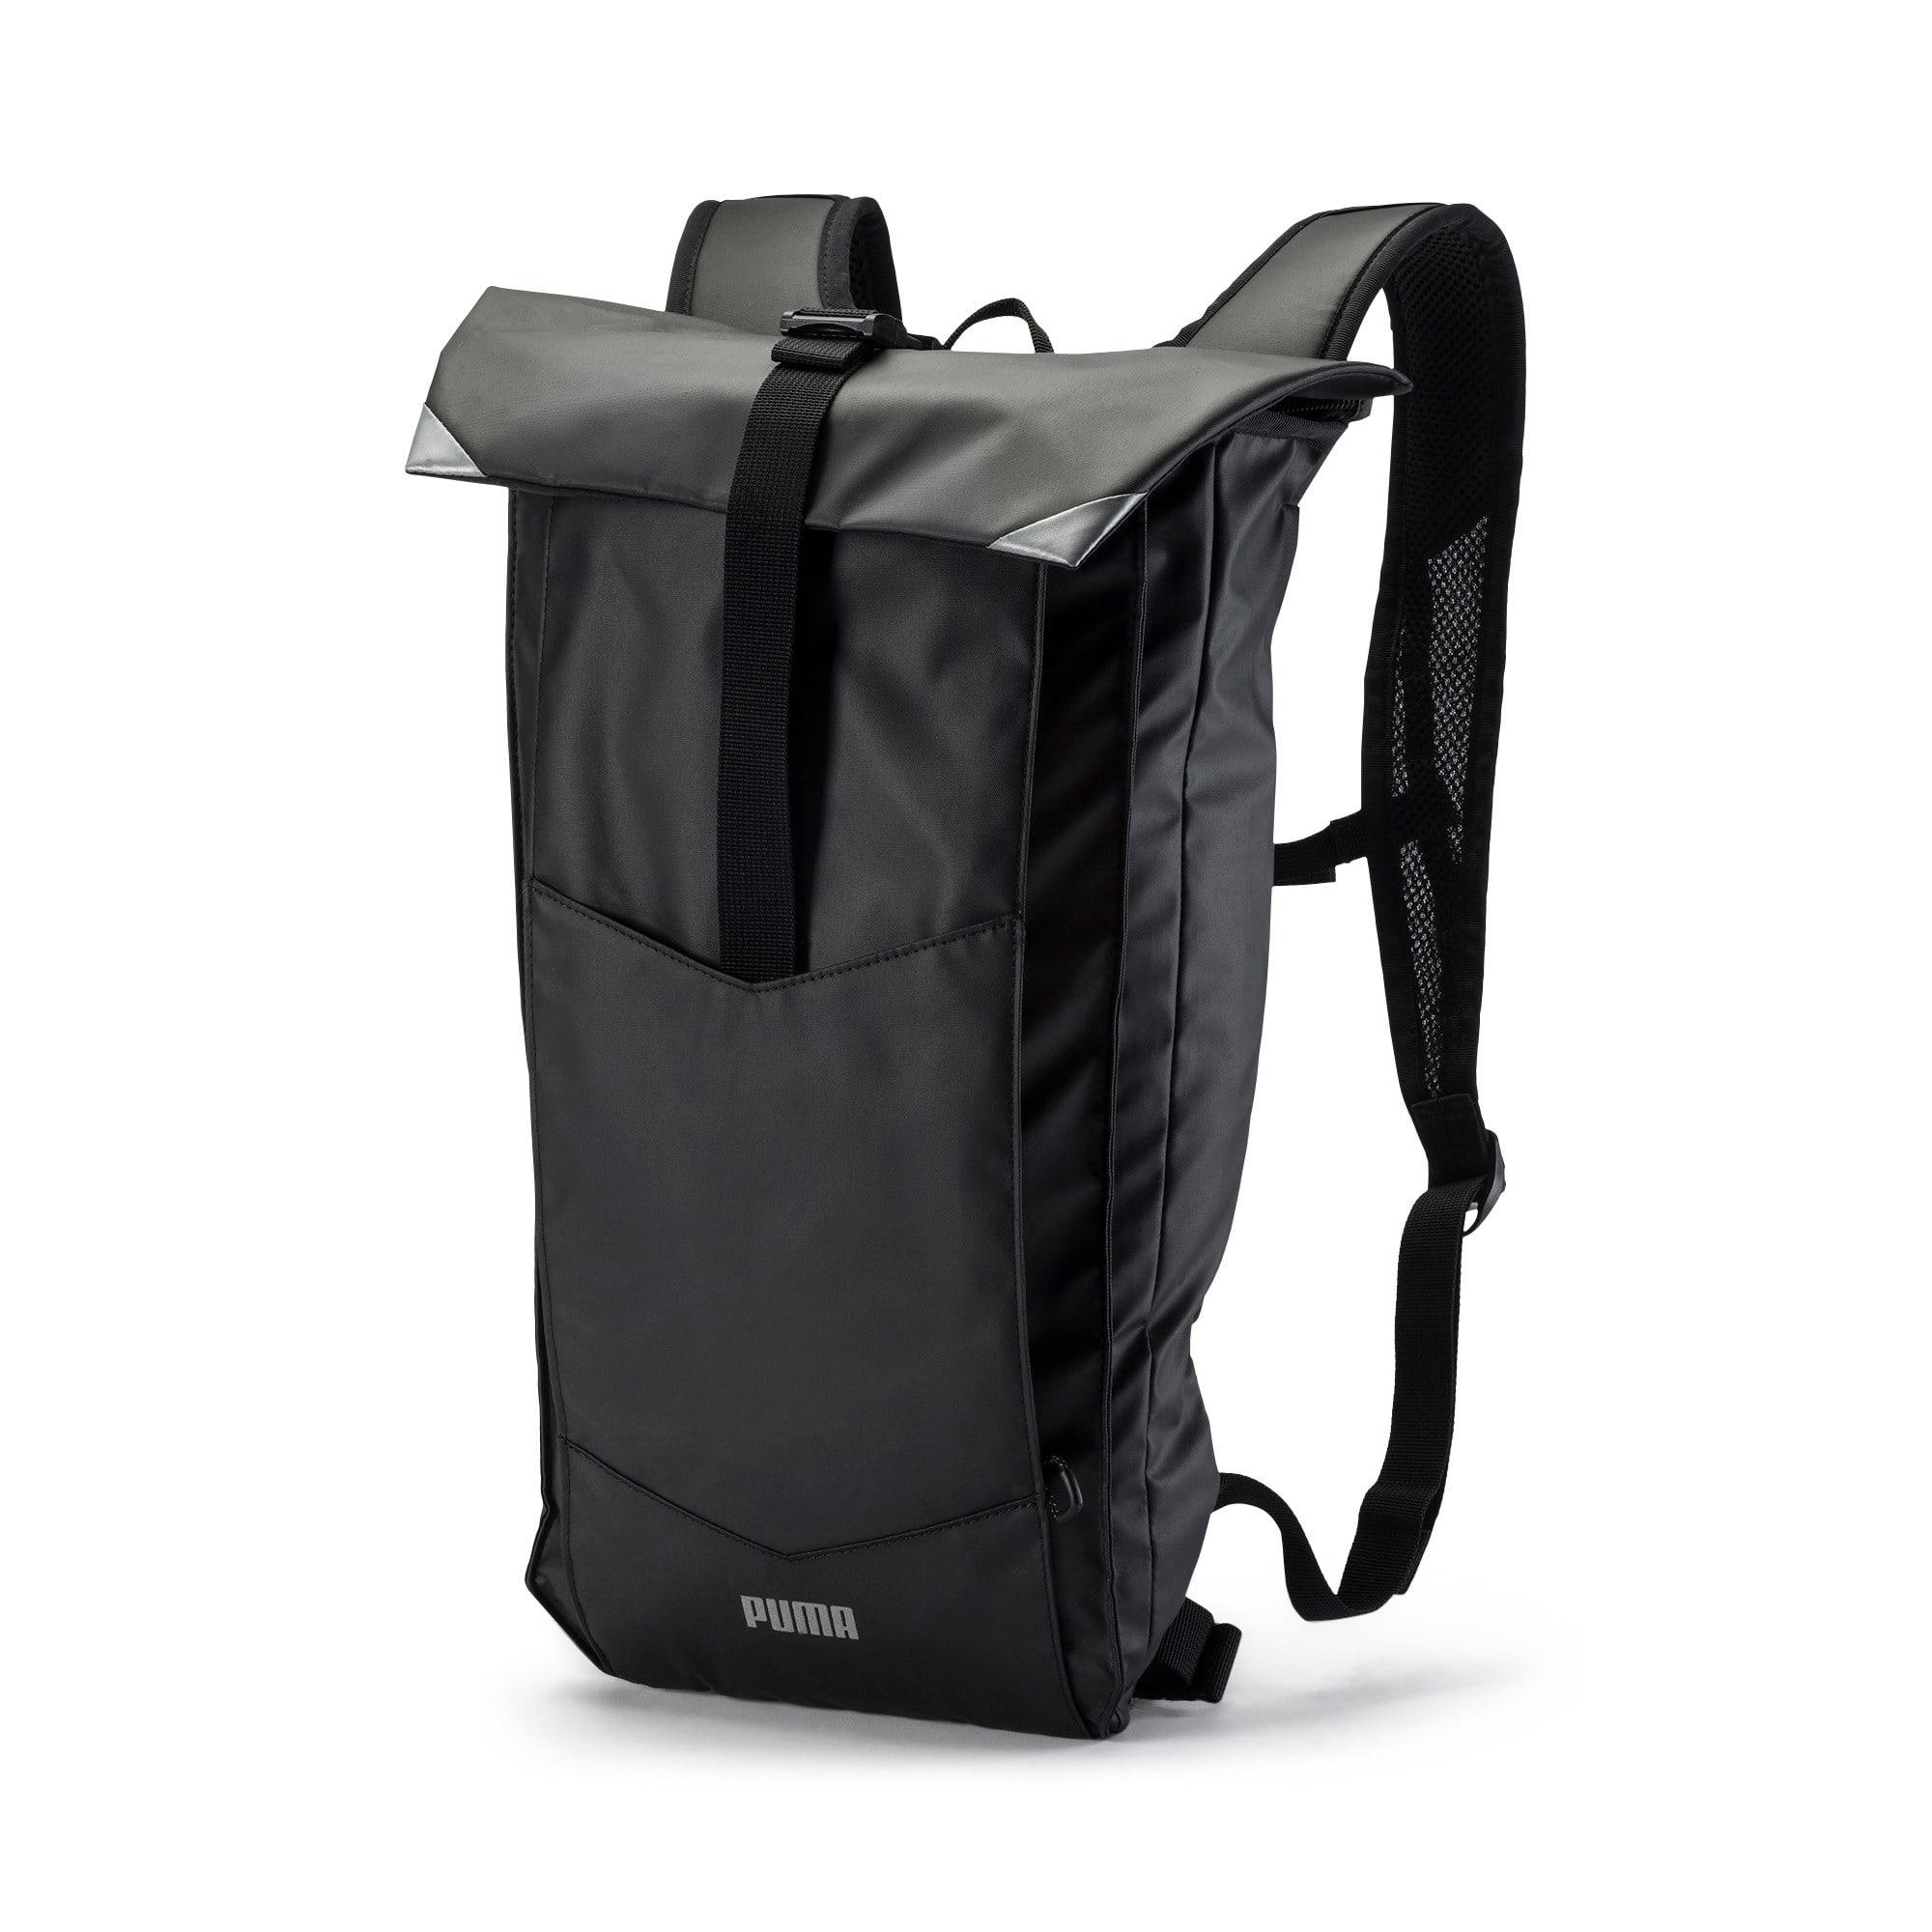 Thumbnail 1 of Street Running Backpack, Puma Black, medium